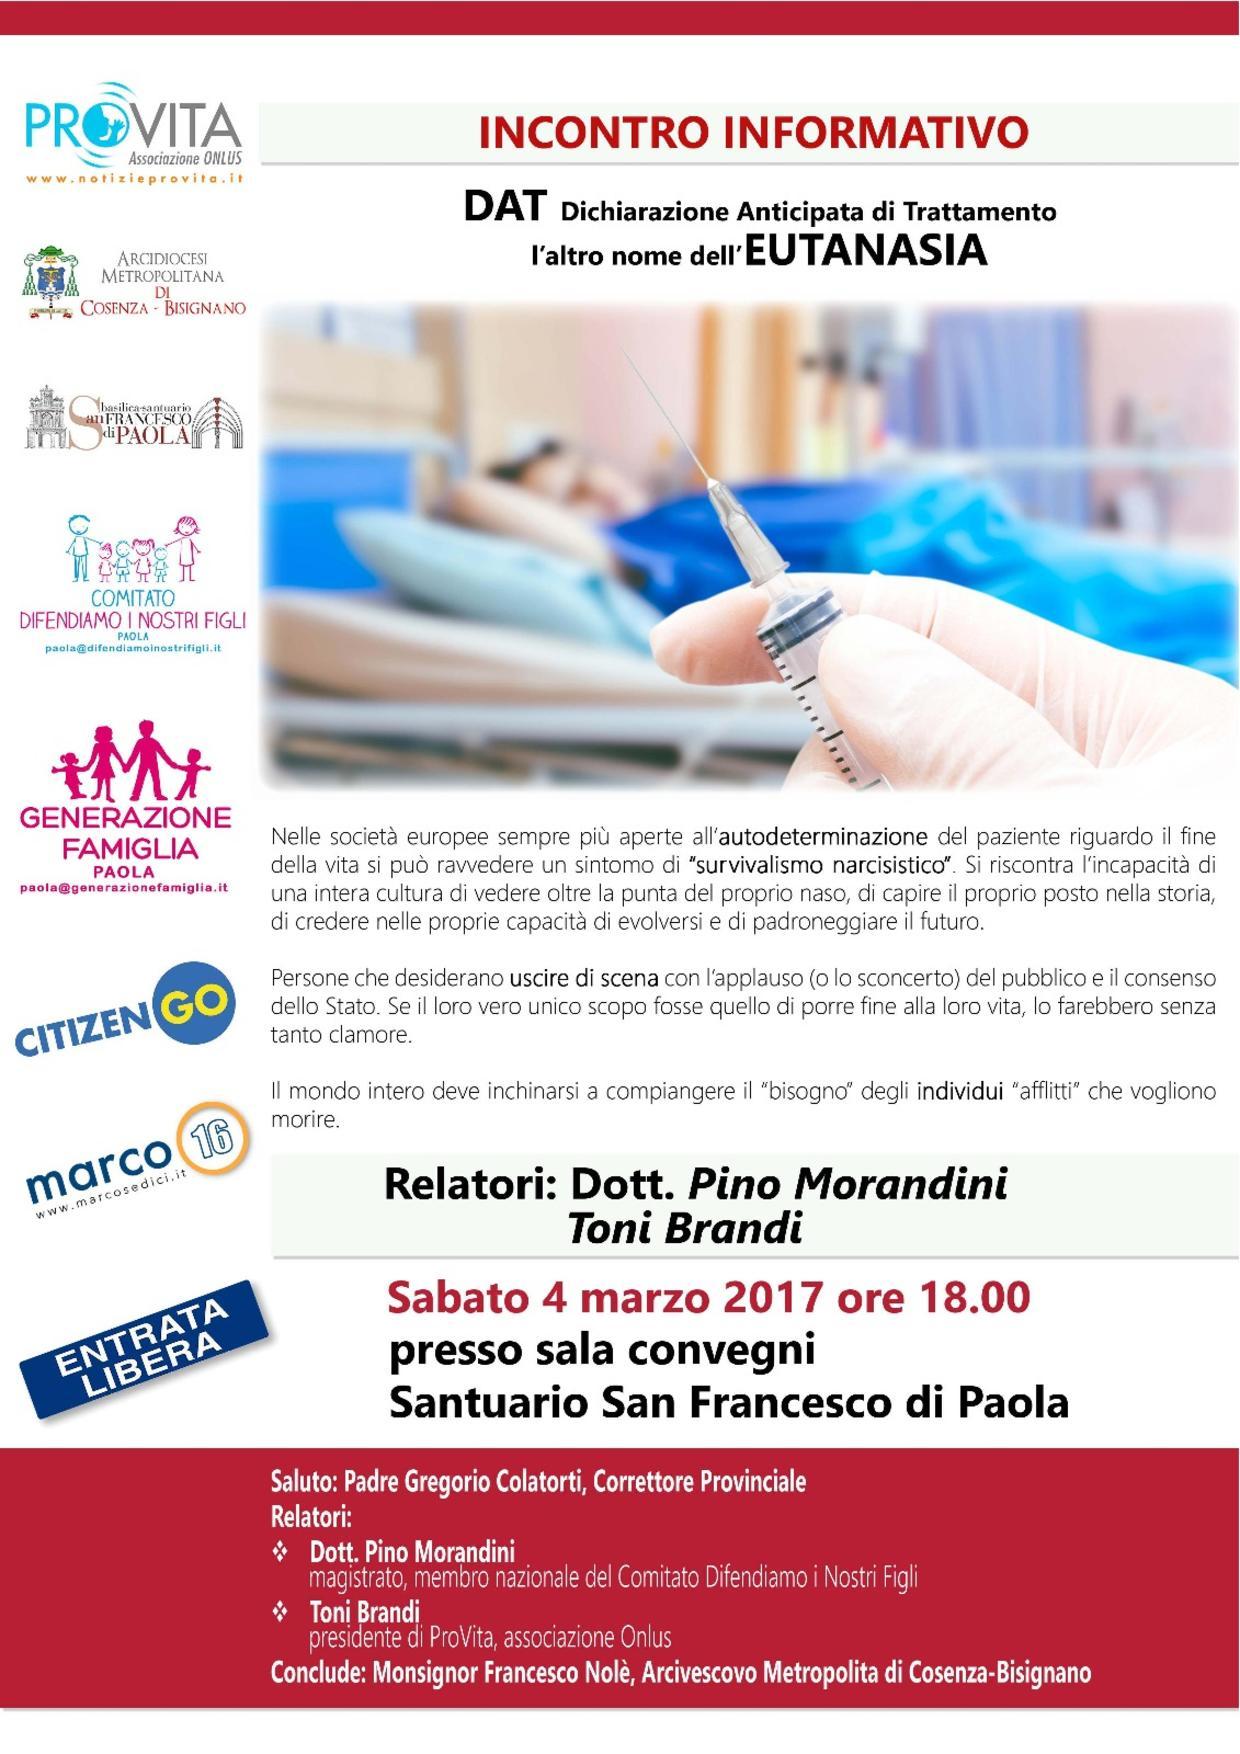 eutanasia_cosenza_ProVita-page-001